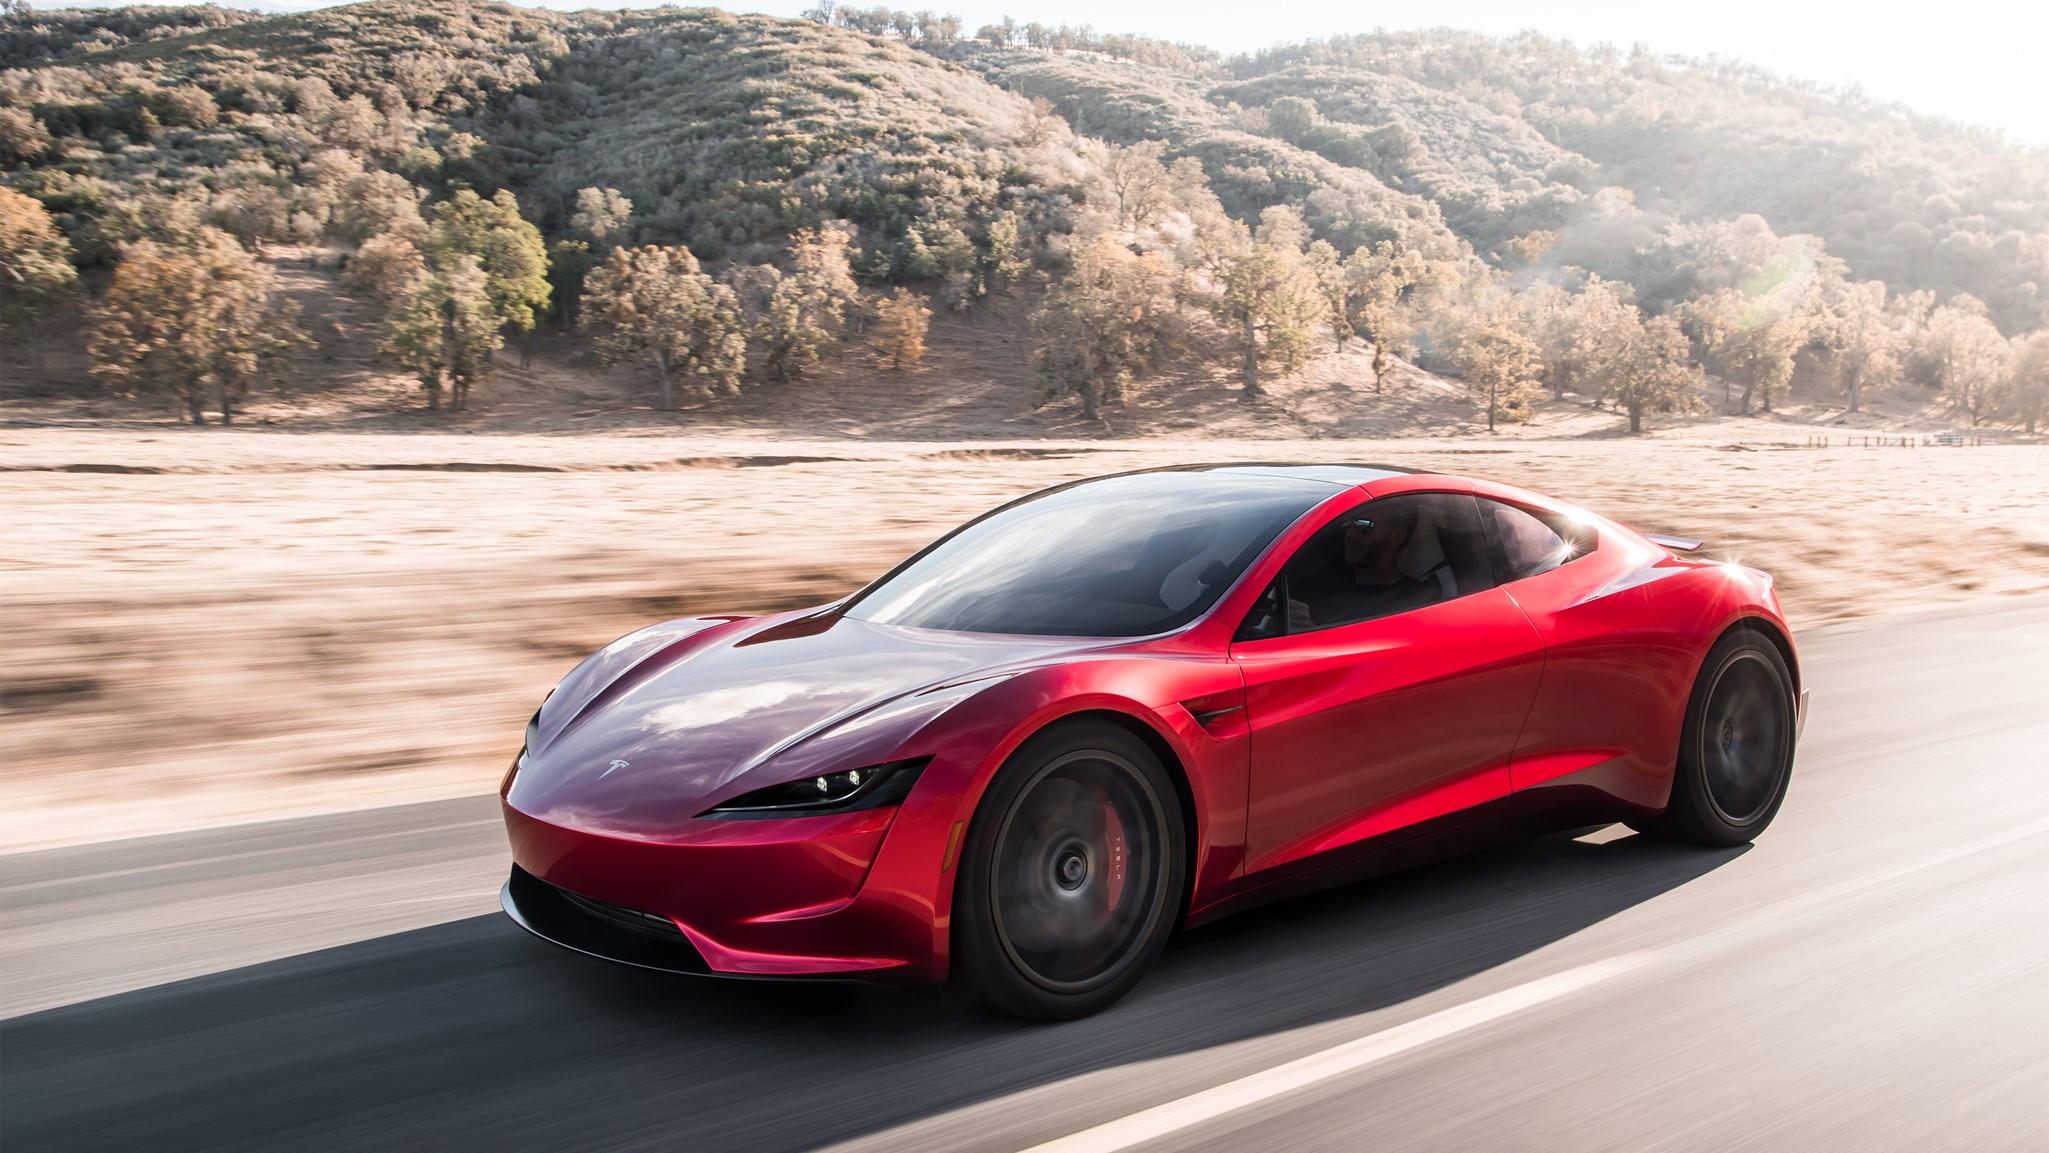 The new 2020 Tesla Roadster